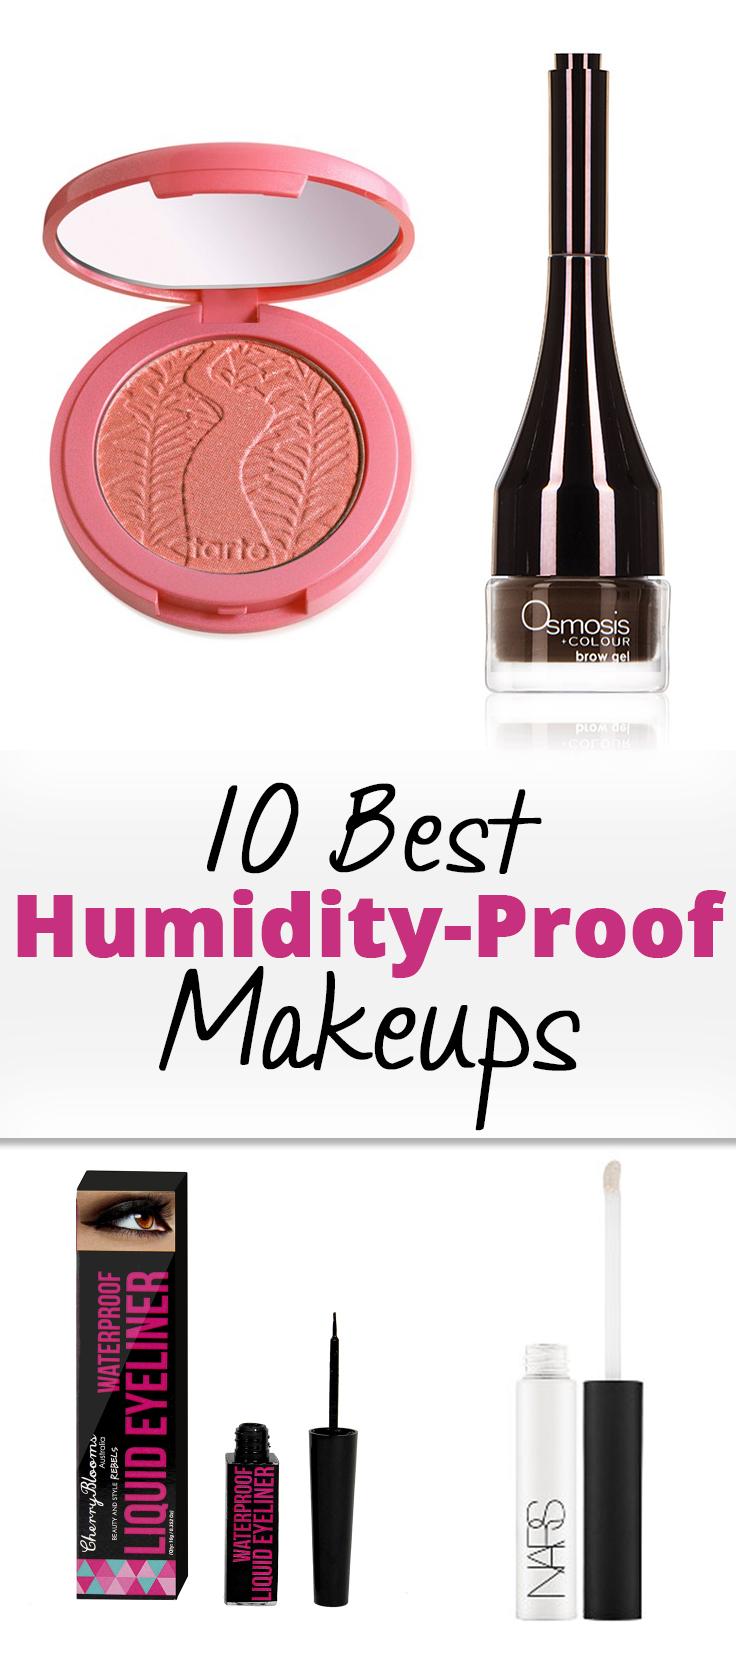 10 Best Humidity-Proof Makeups